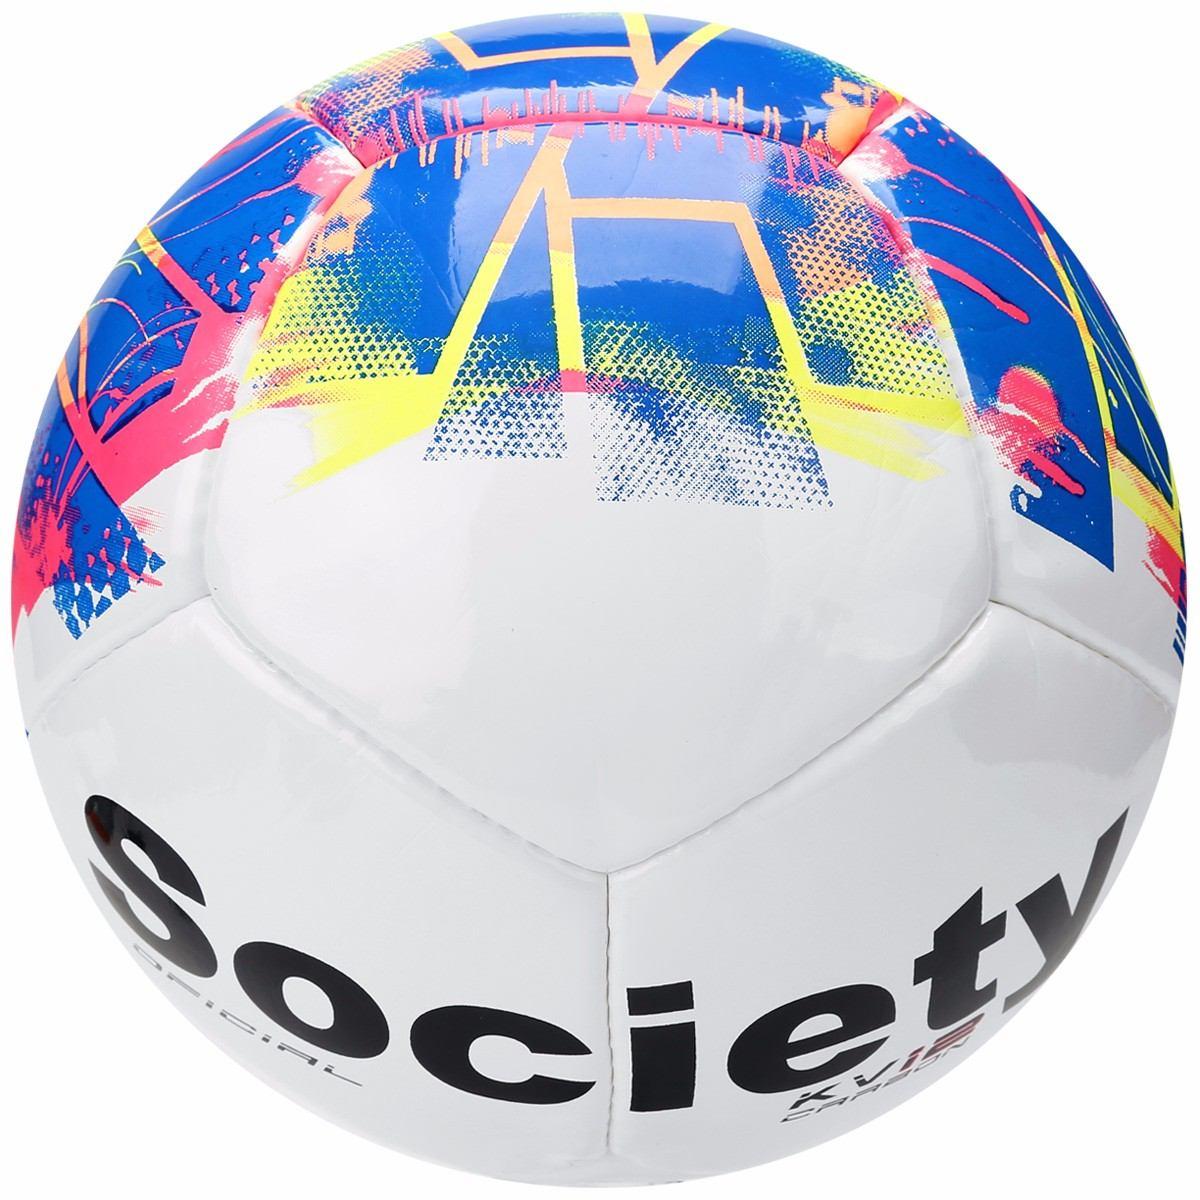 312856ce16 Bola Futebol De Society Topper Kv 12 Carbom Grama Sintética - R  94 ...